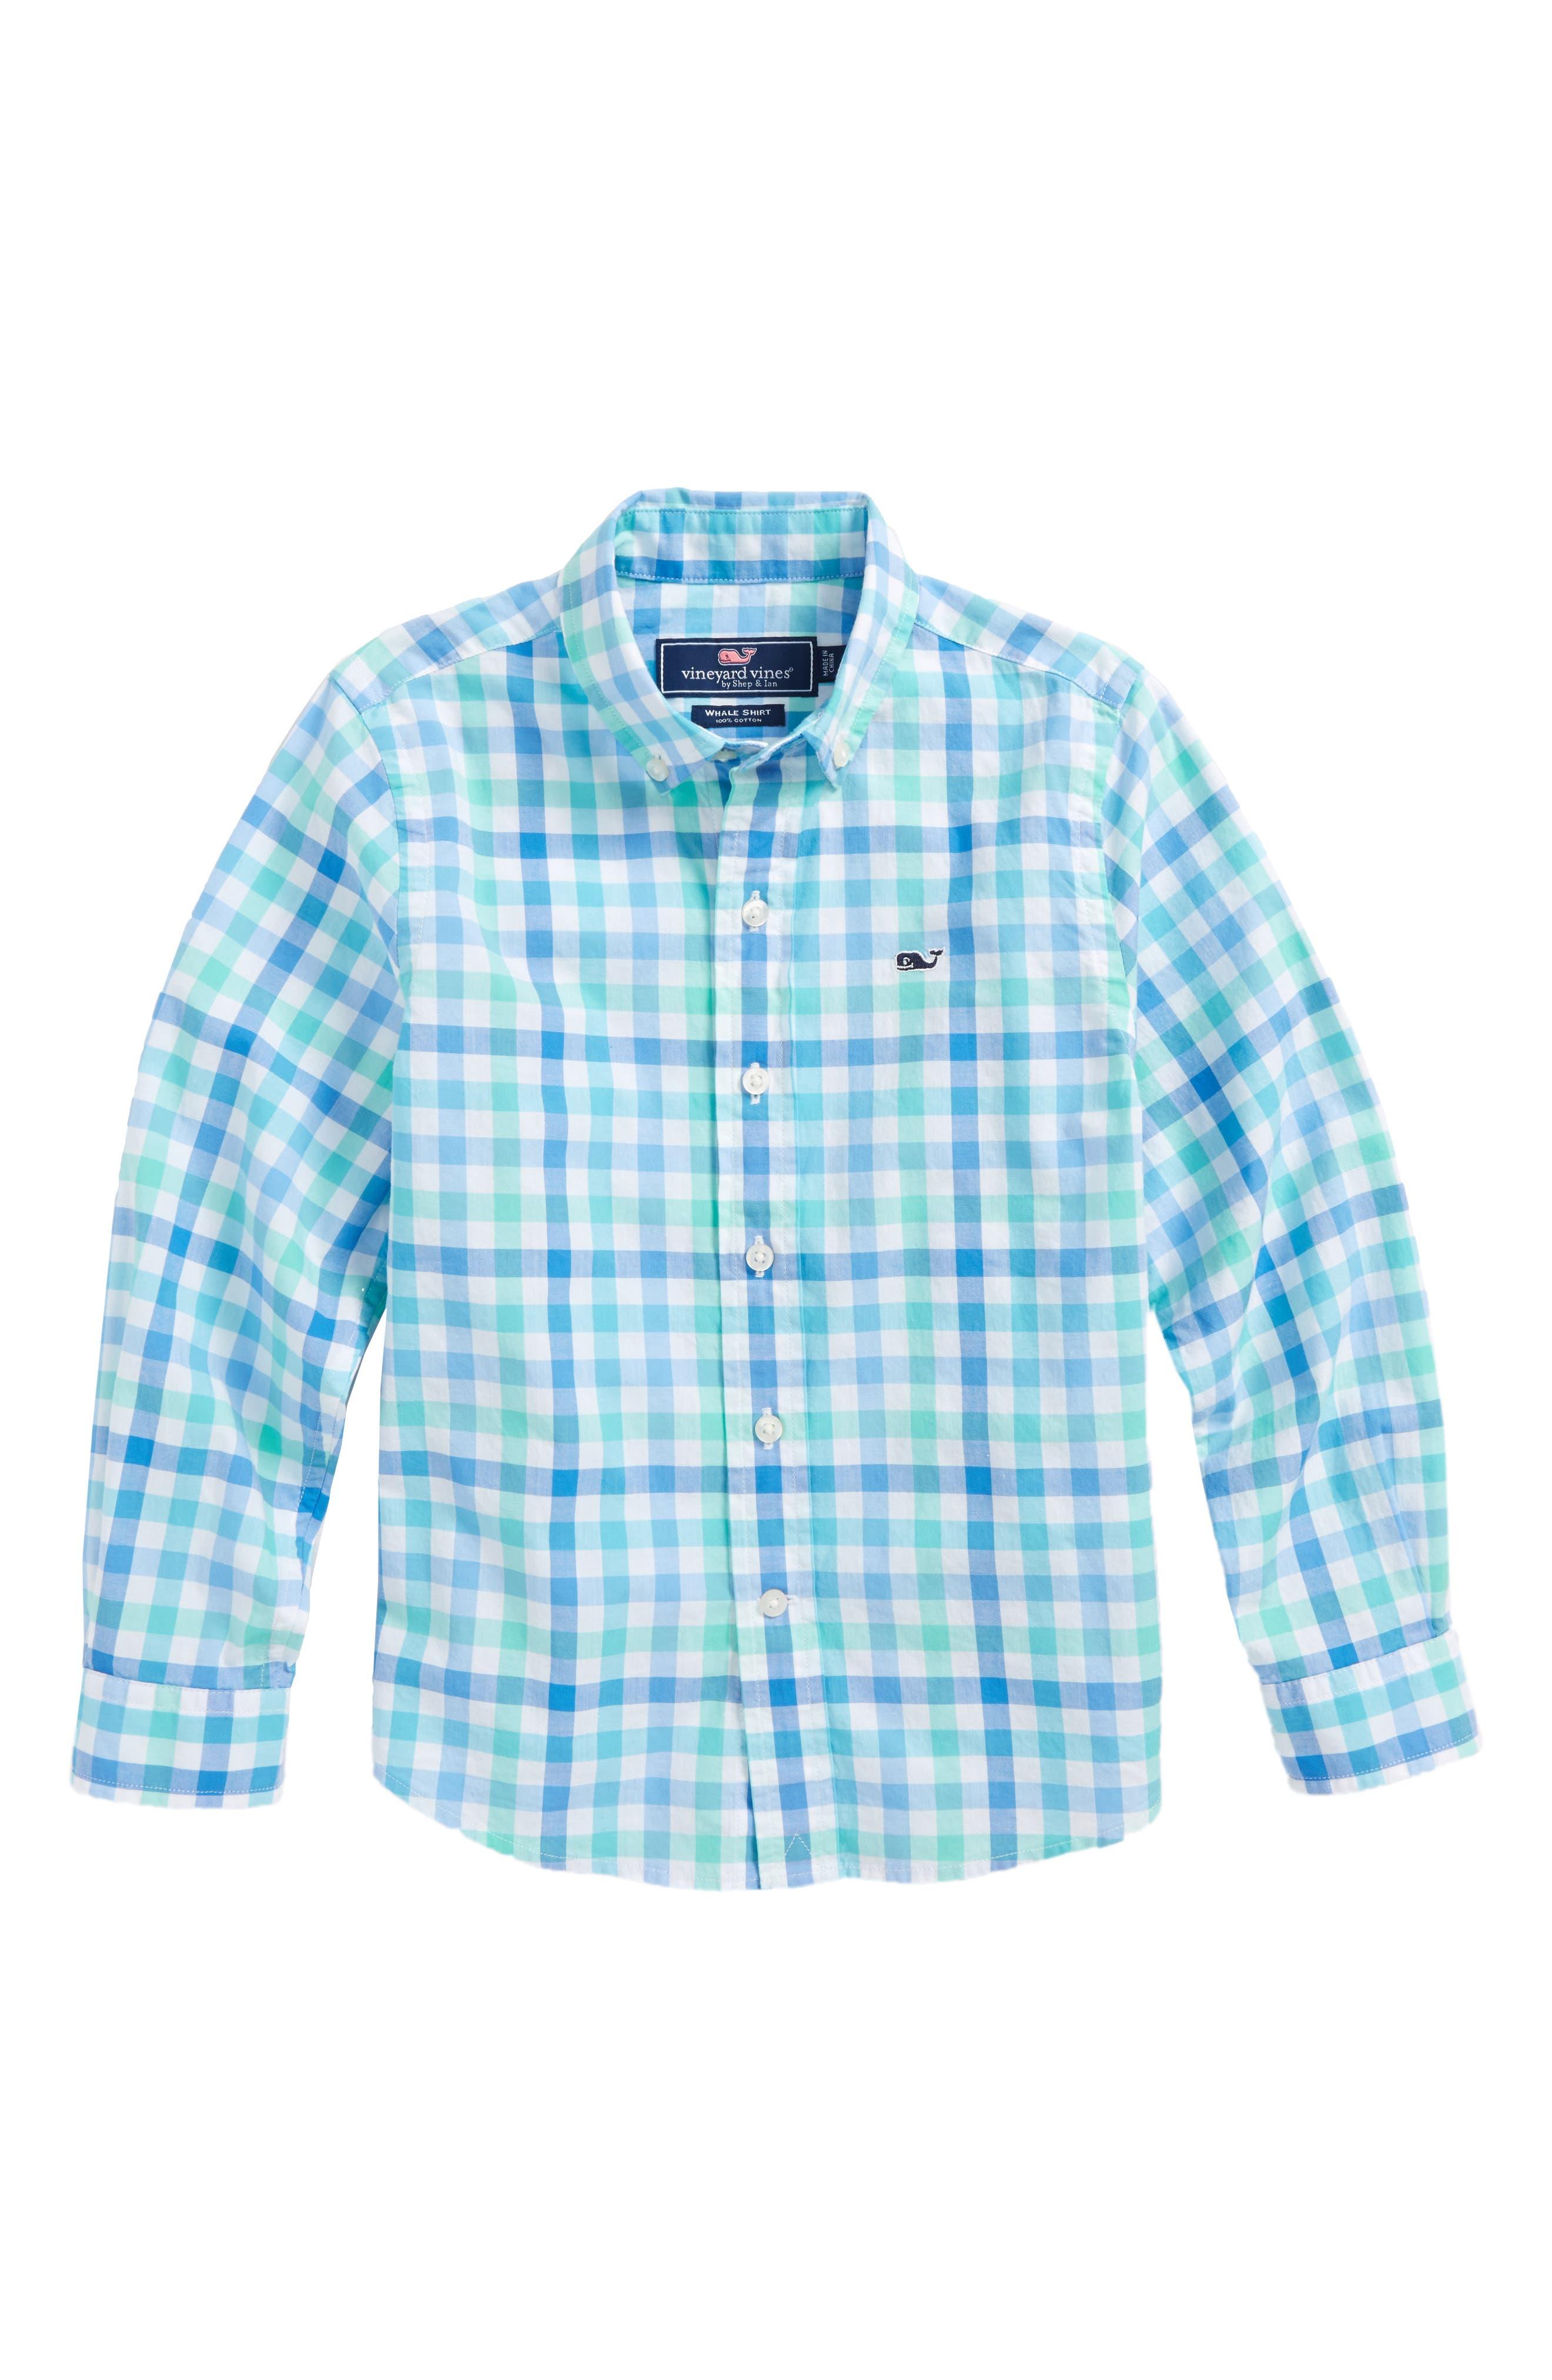 Eagle's Nest Gingham Dress Shirt,                         Main,                         color, Turqs